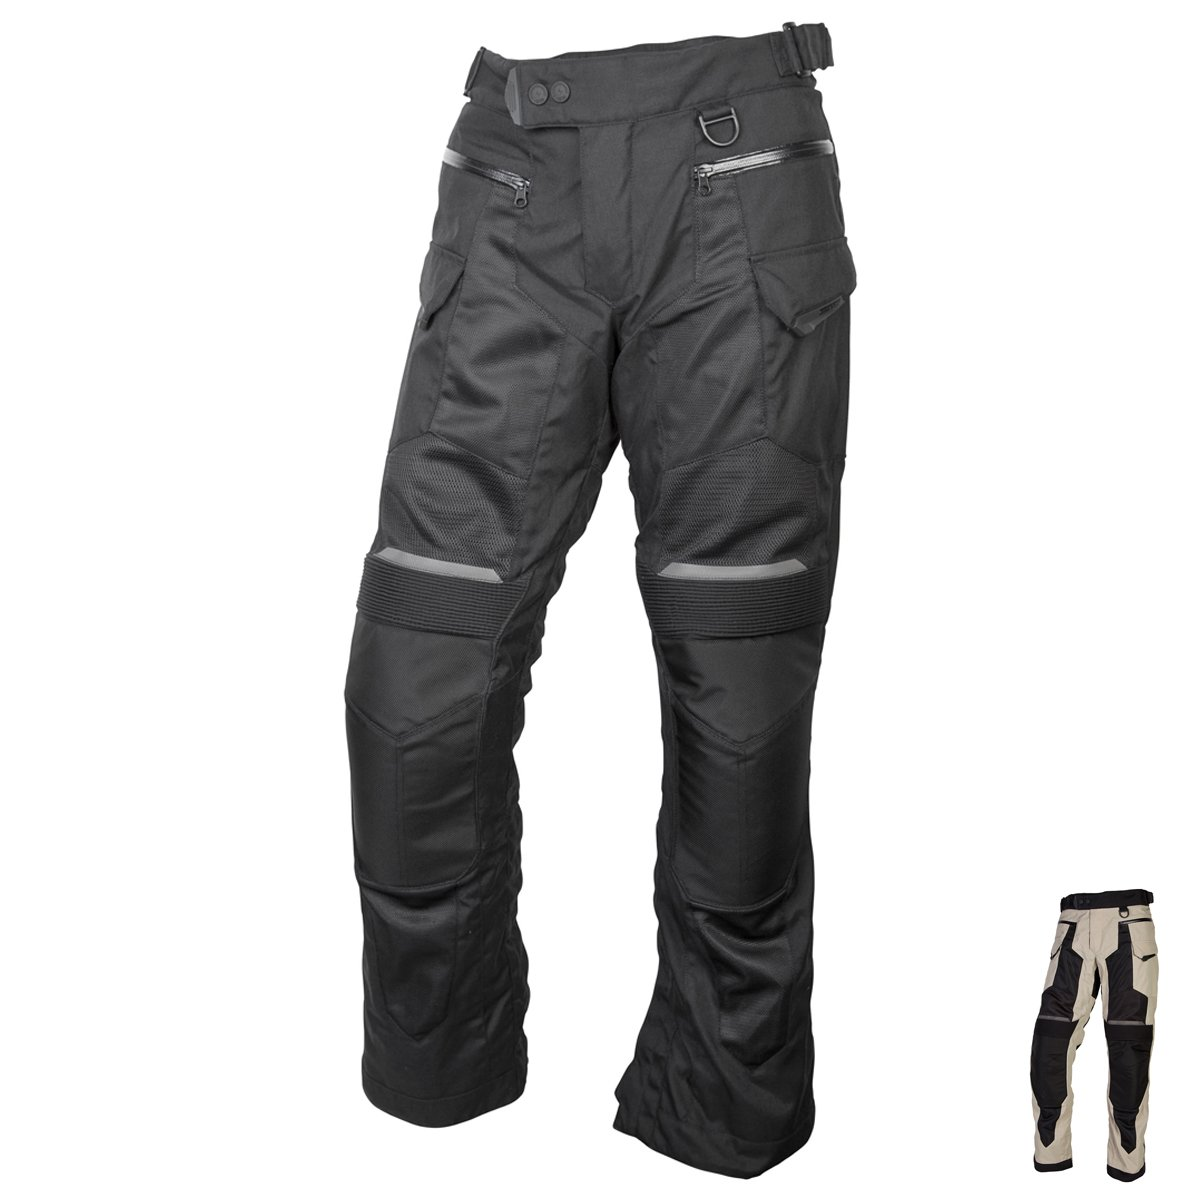 Scorpion EXO Men's Yuma Sand Pants, S